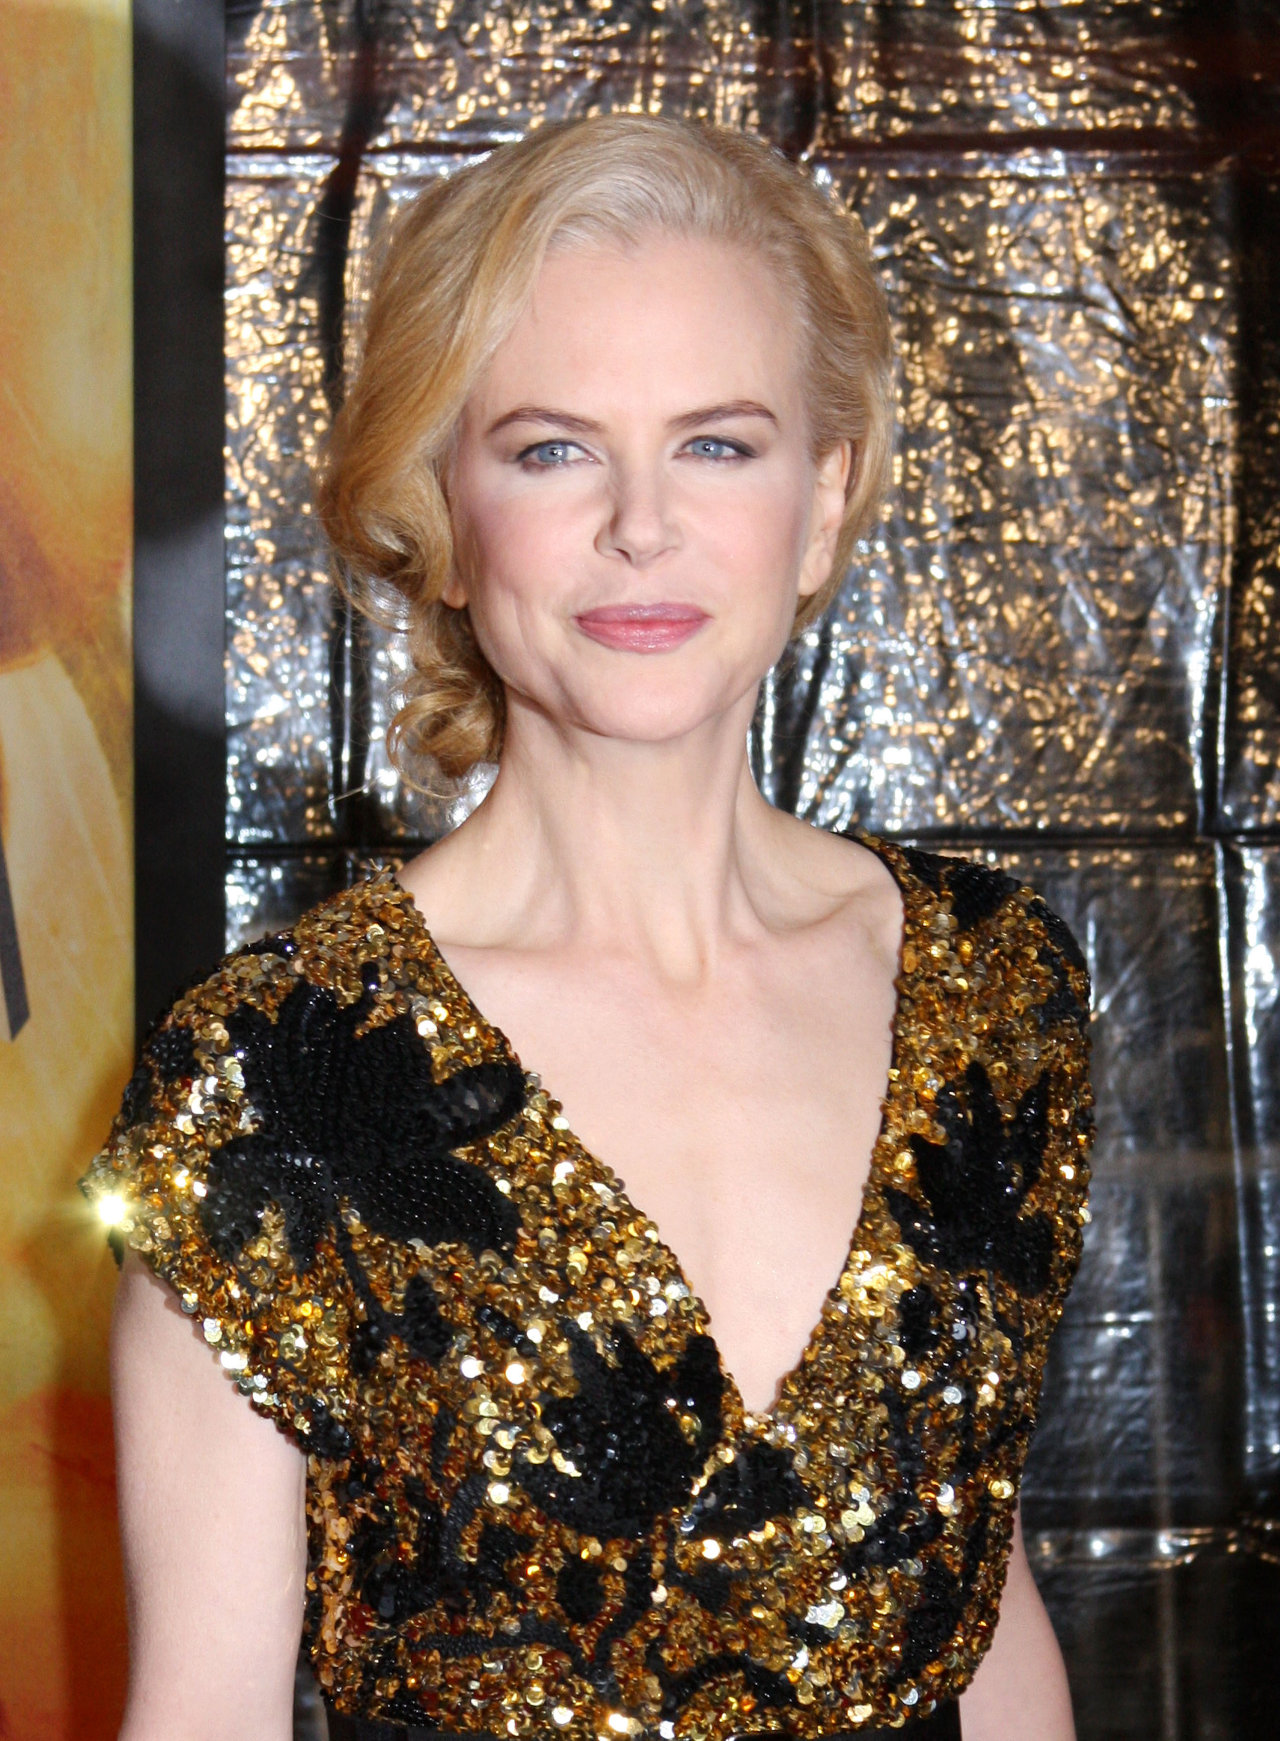 Nicole Kidman leaked wallpapers